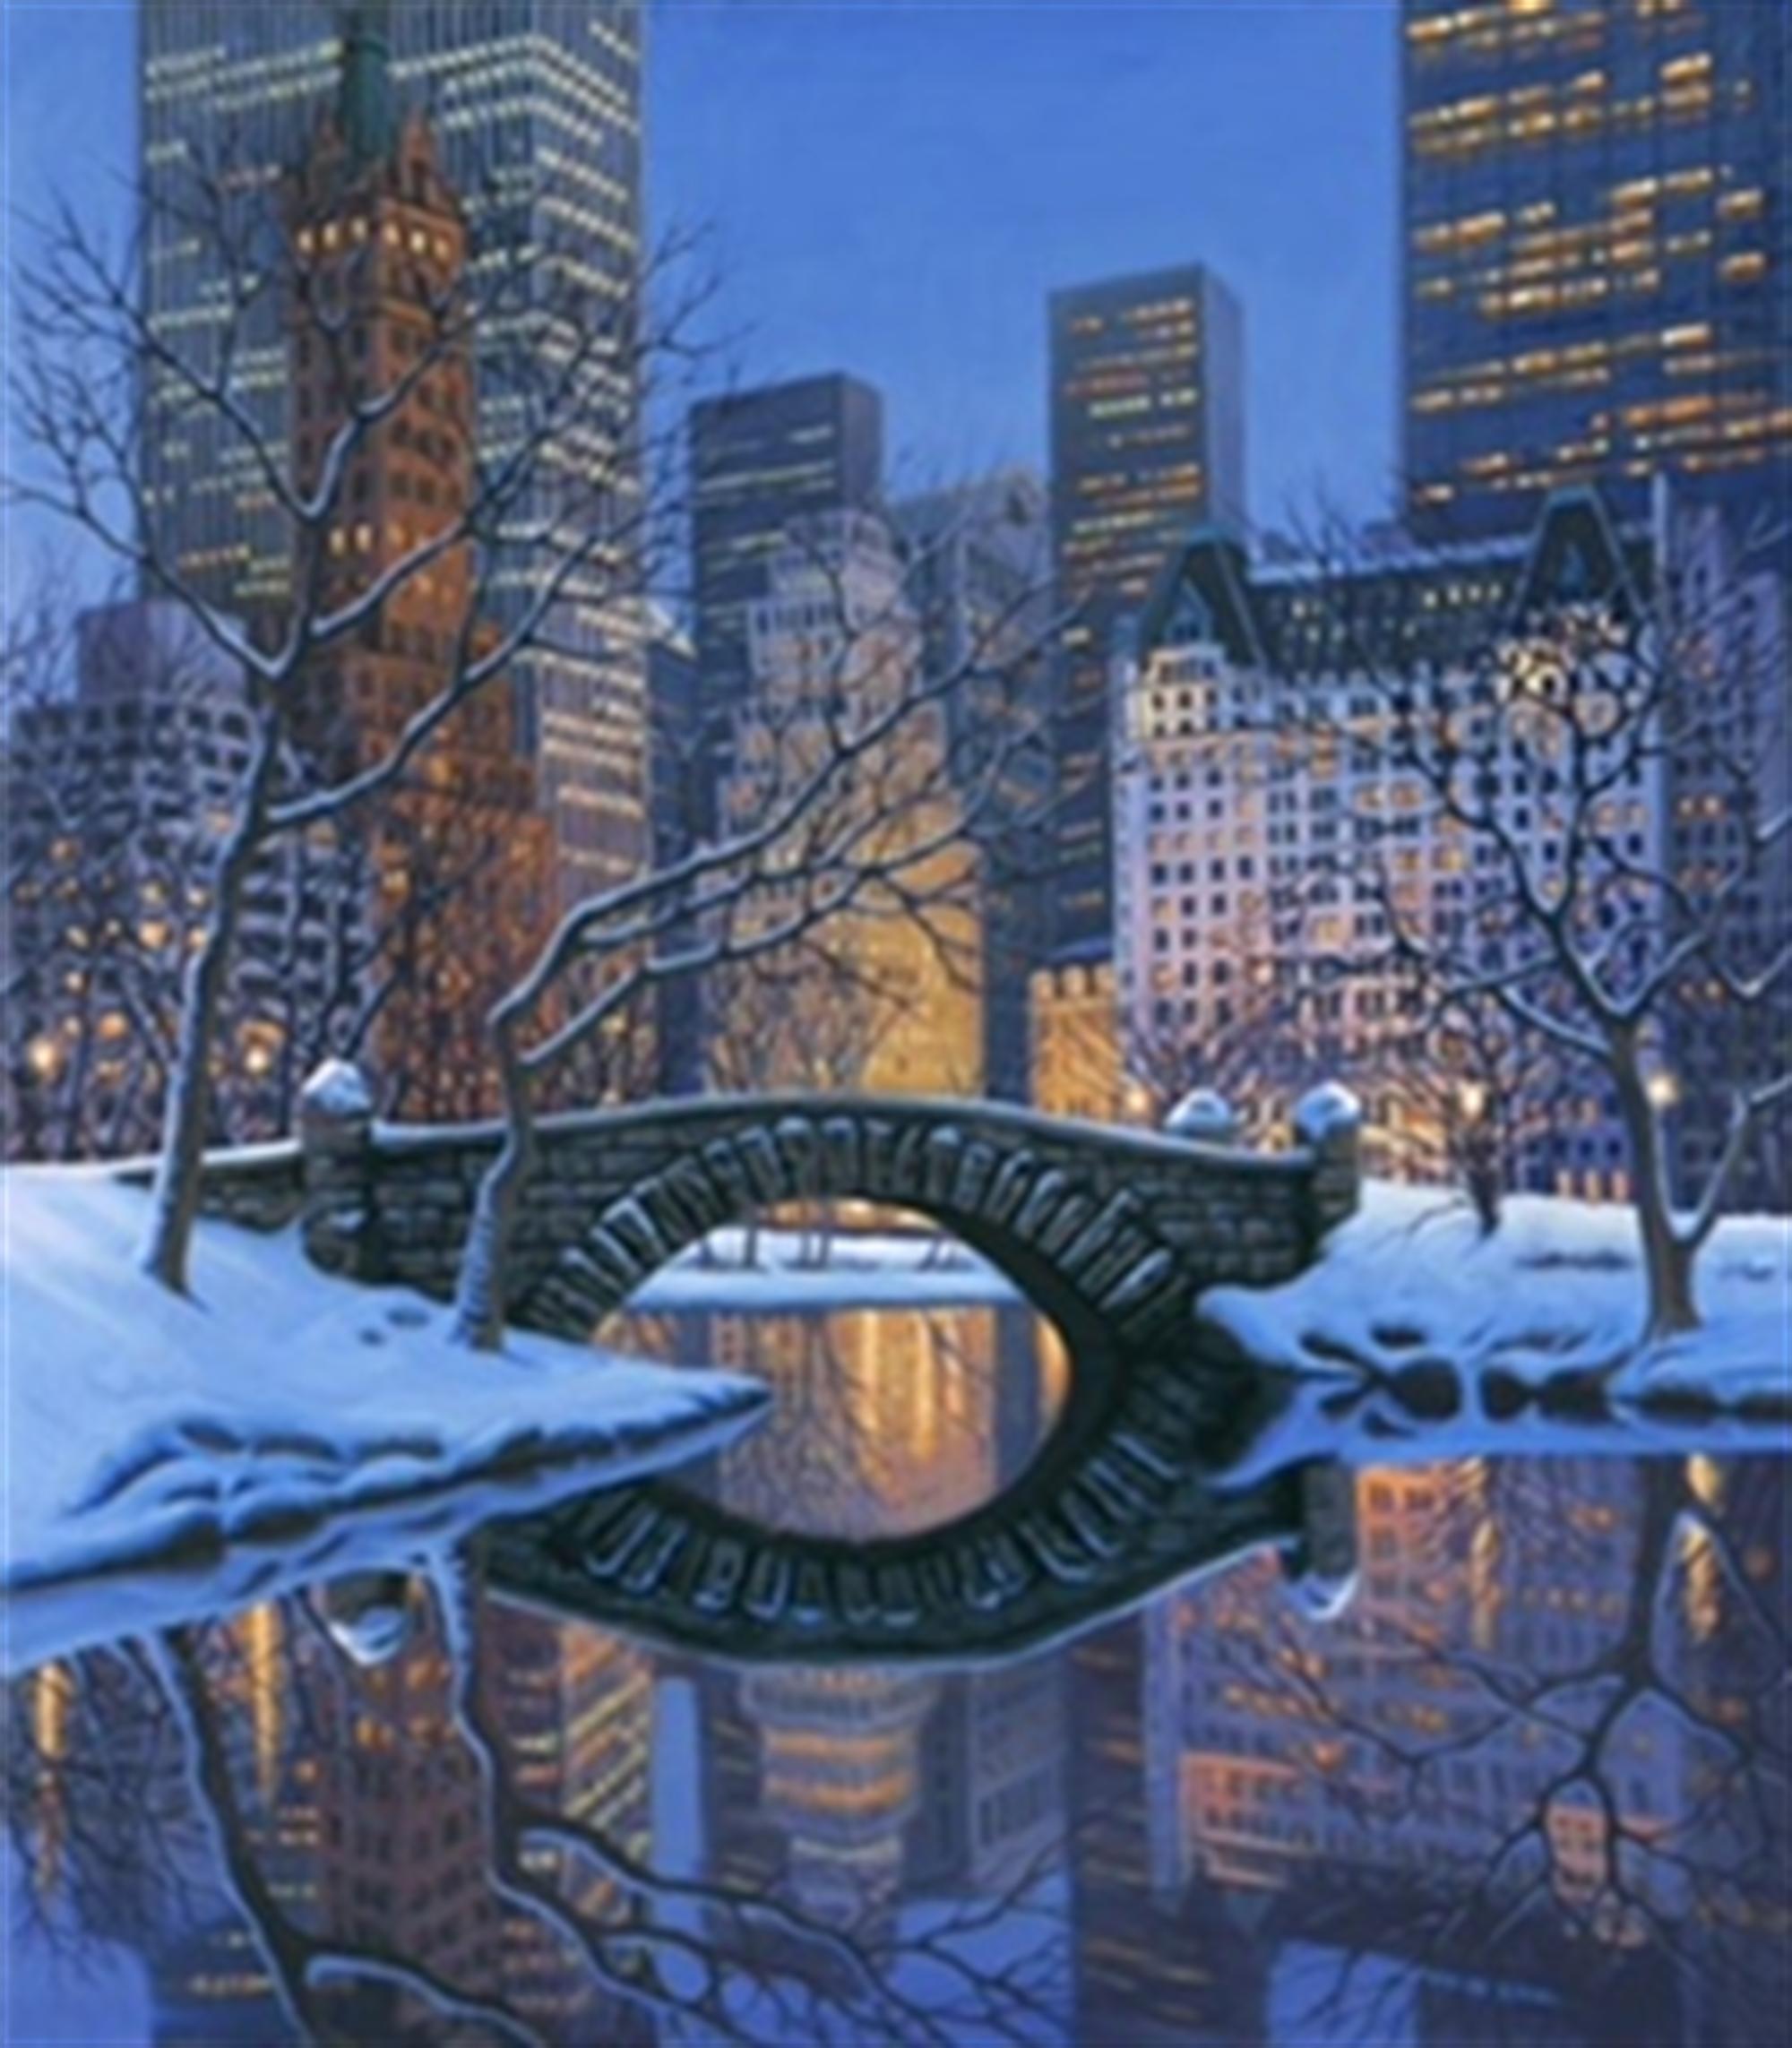 New York - New York by Alexei Butirskiy